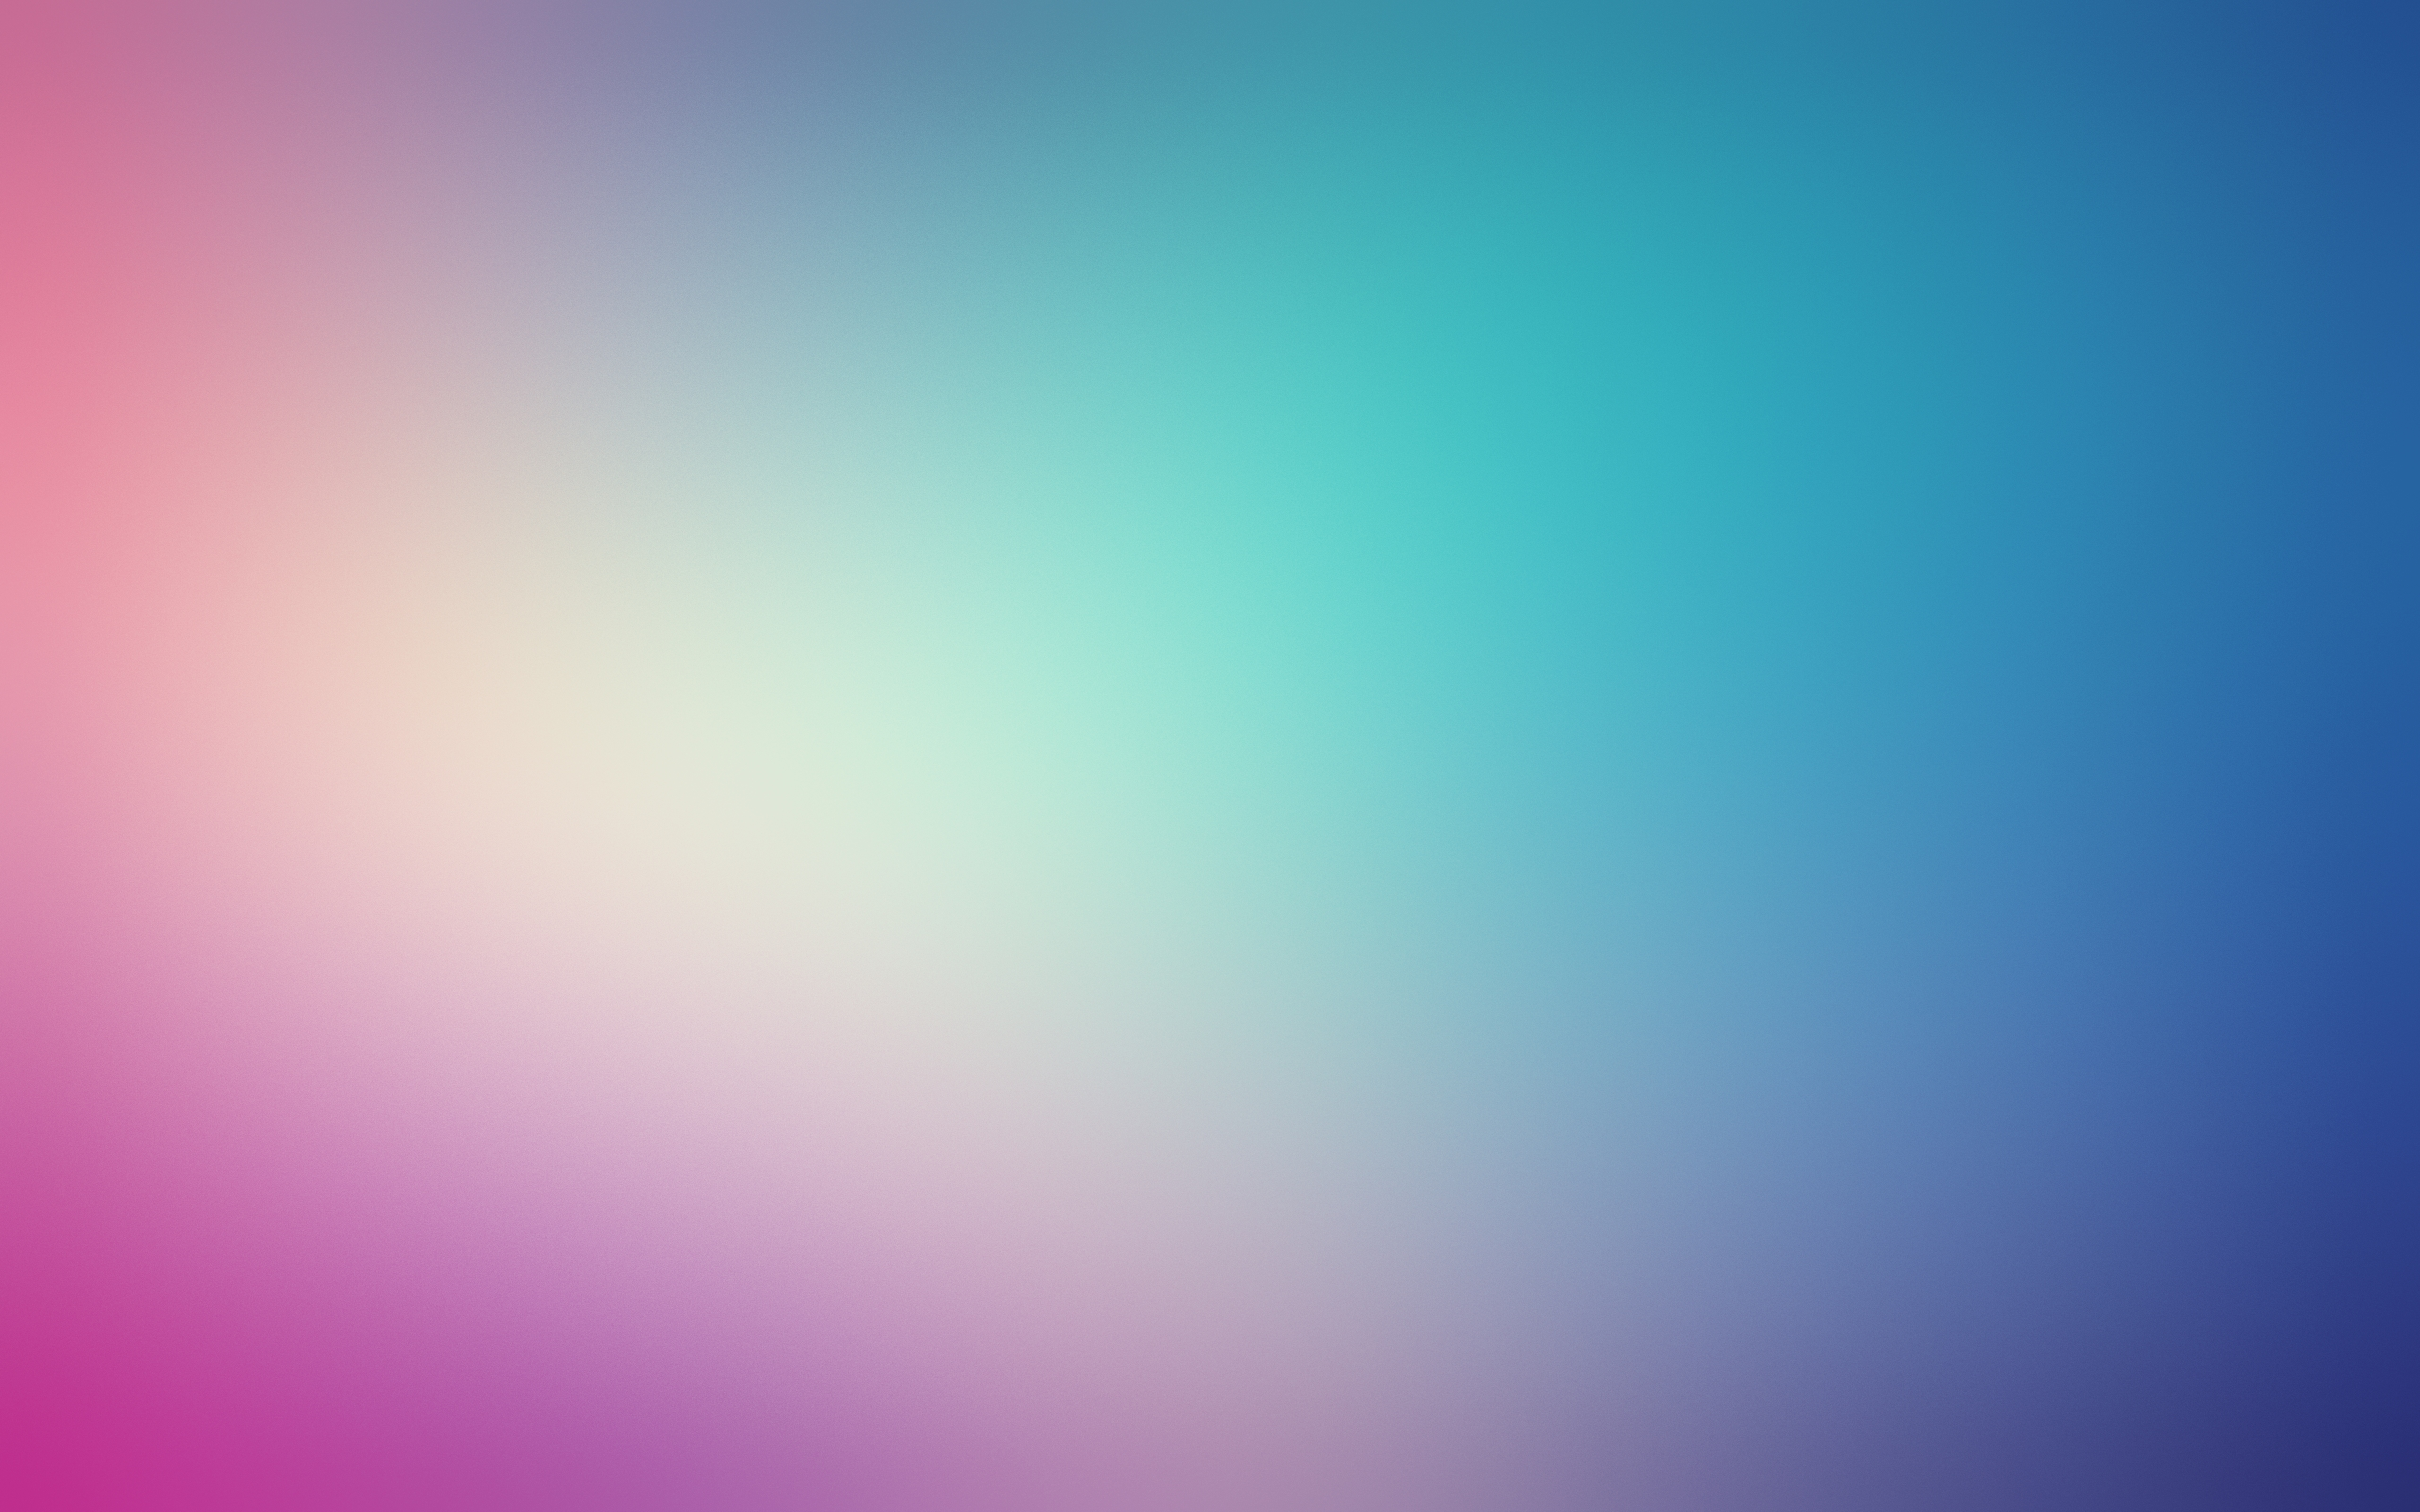 blue blur 2 wallpaper - photo #46